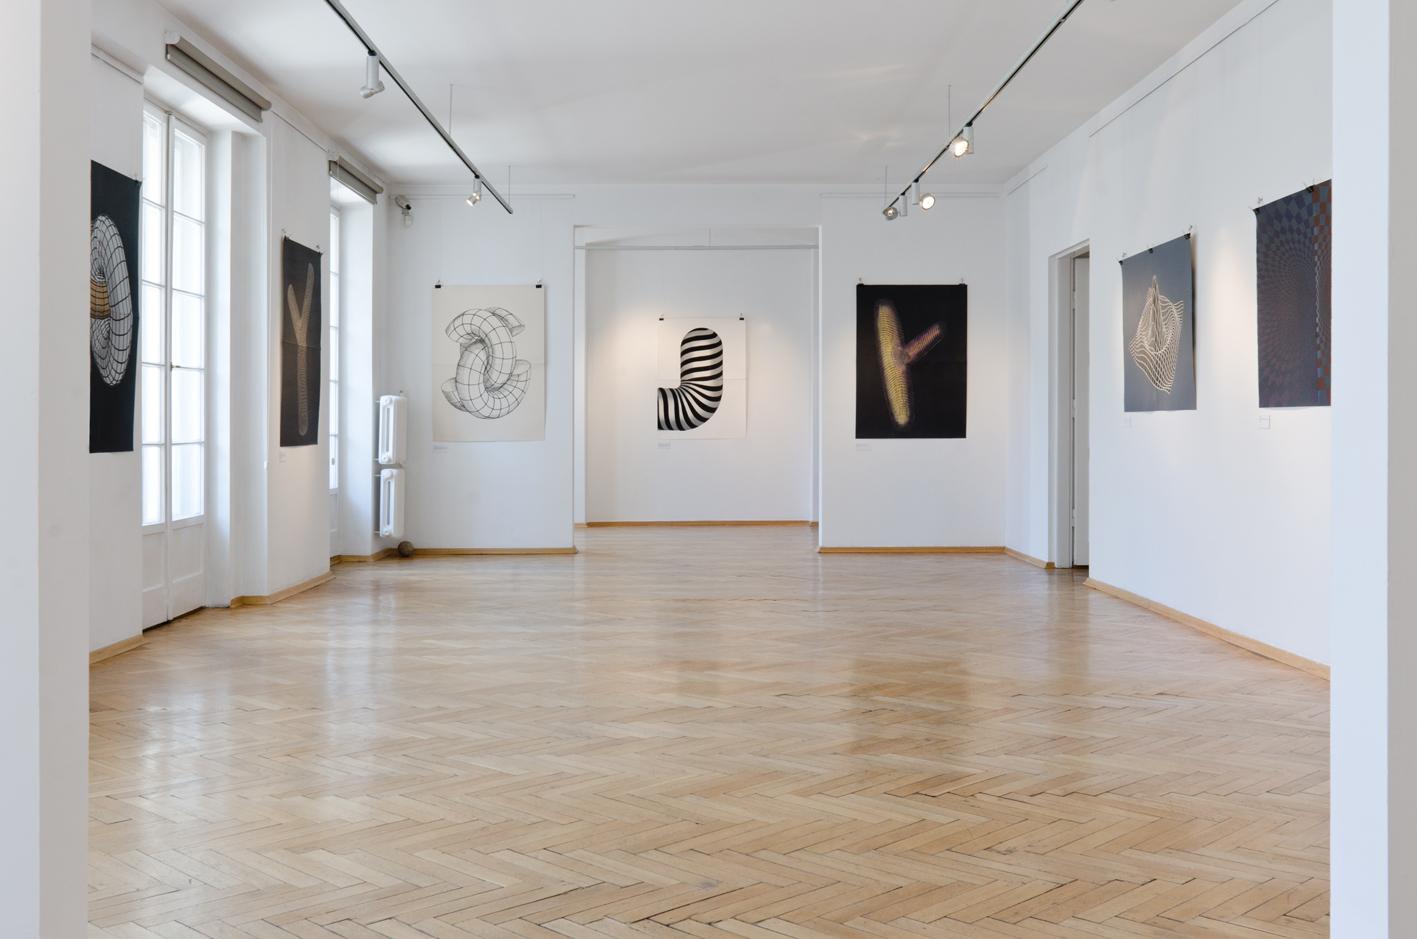 TOROIDAL SPACE linocut_Doctorate exhibition